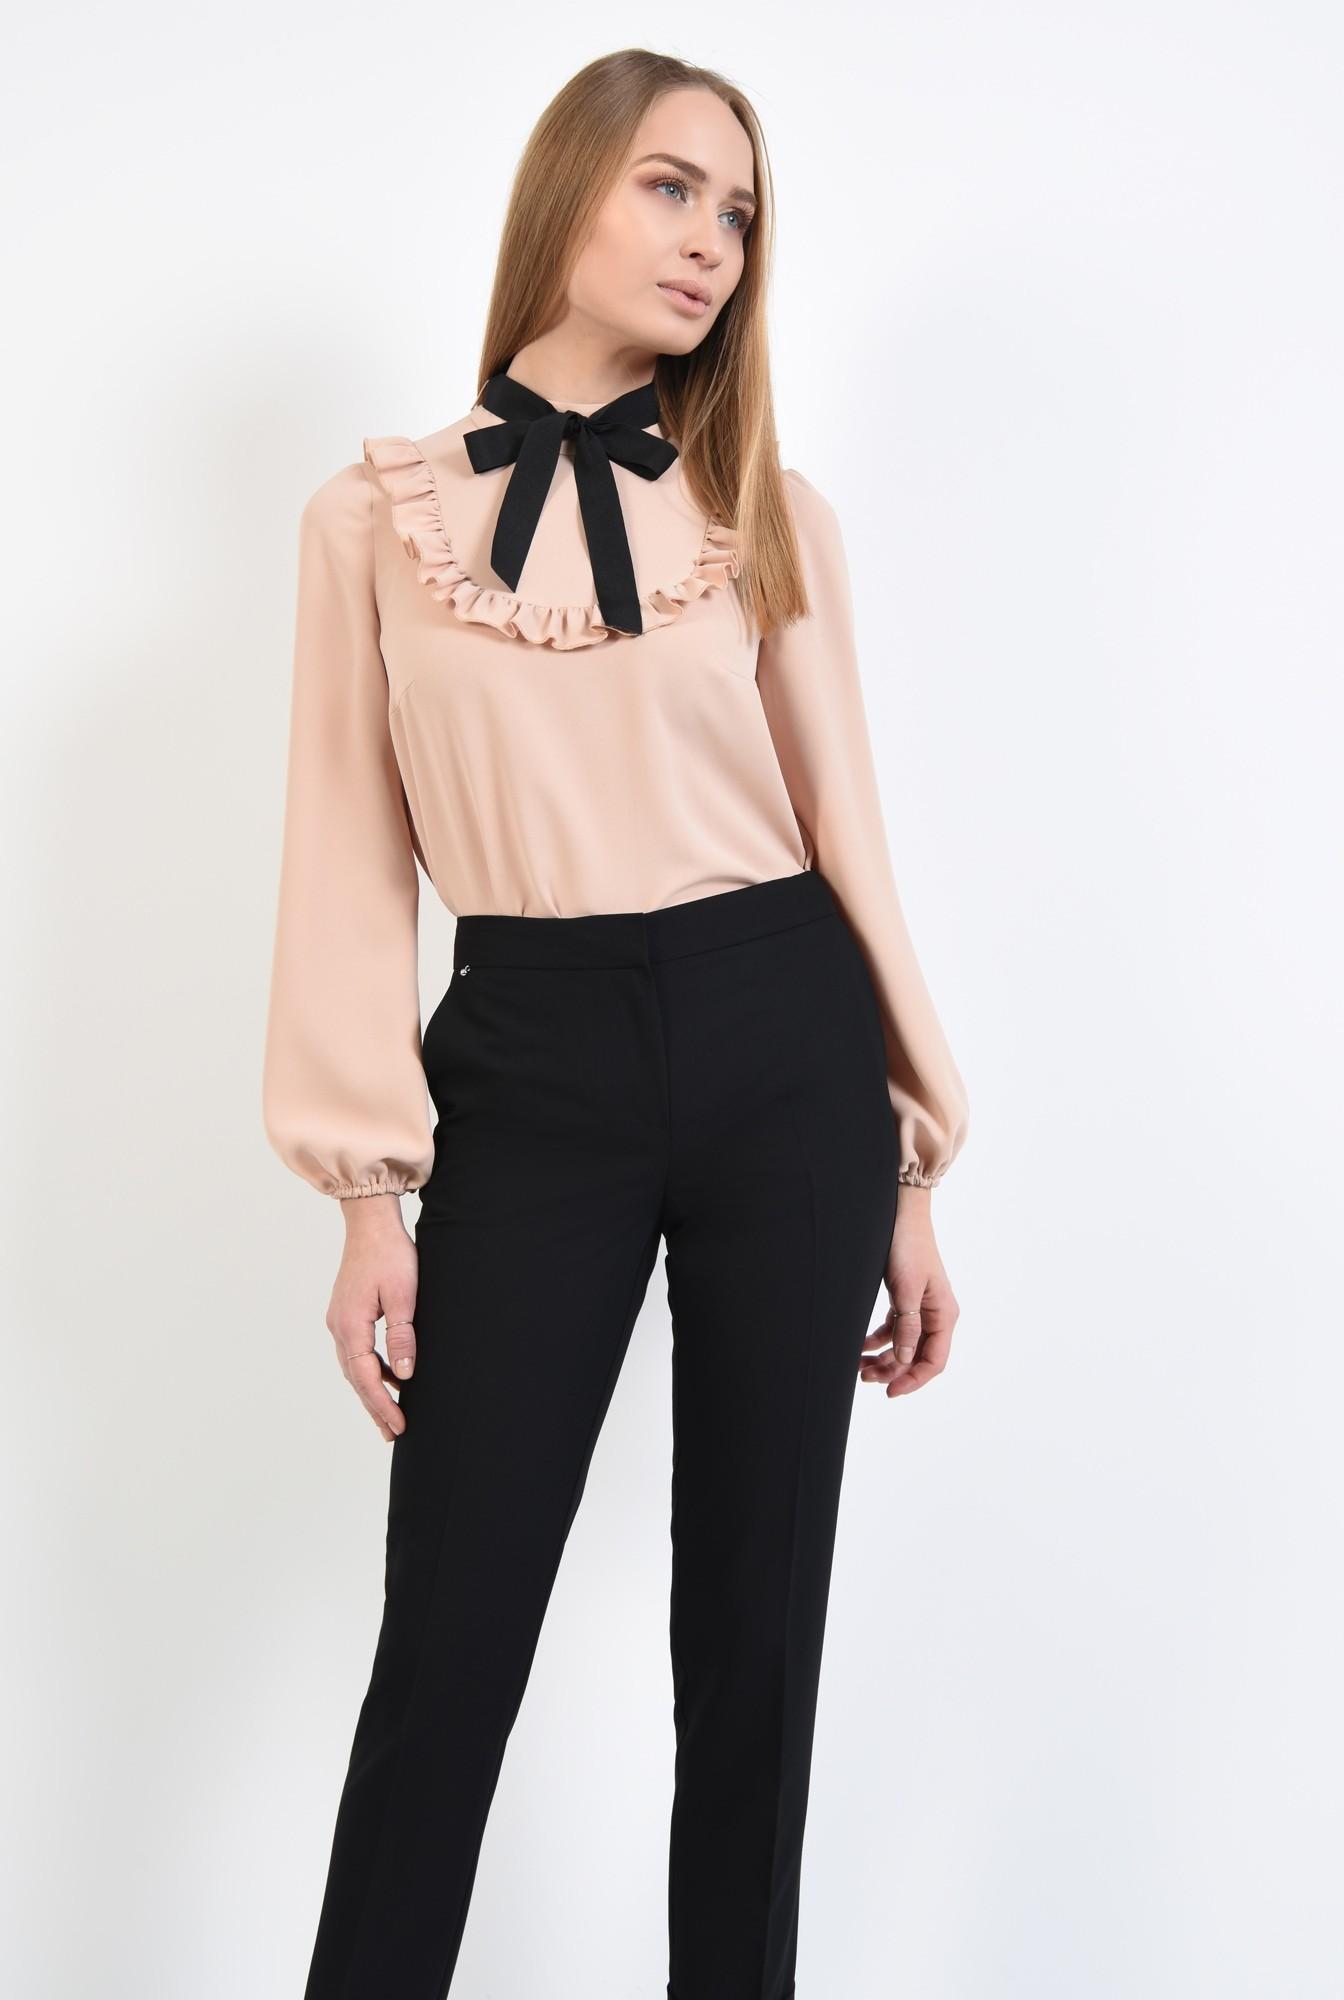 2 - pantaloni tigareta, cu mansete, cu talie medie, buzunare